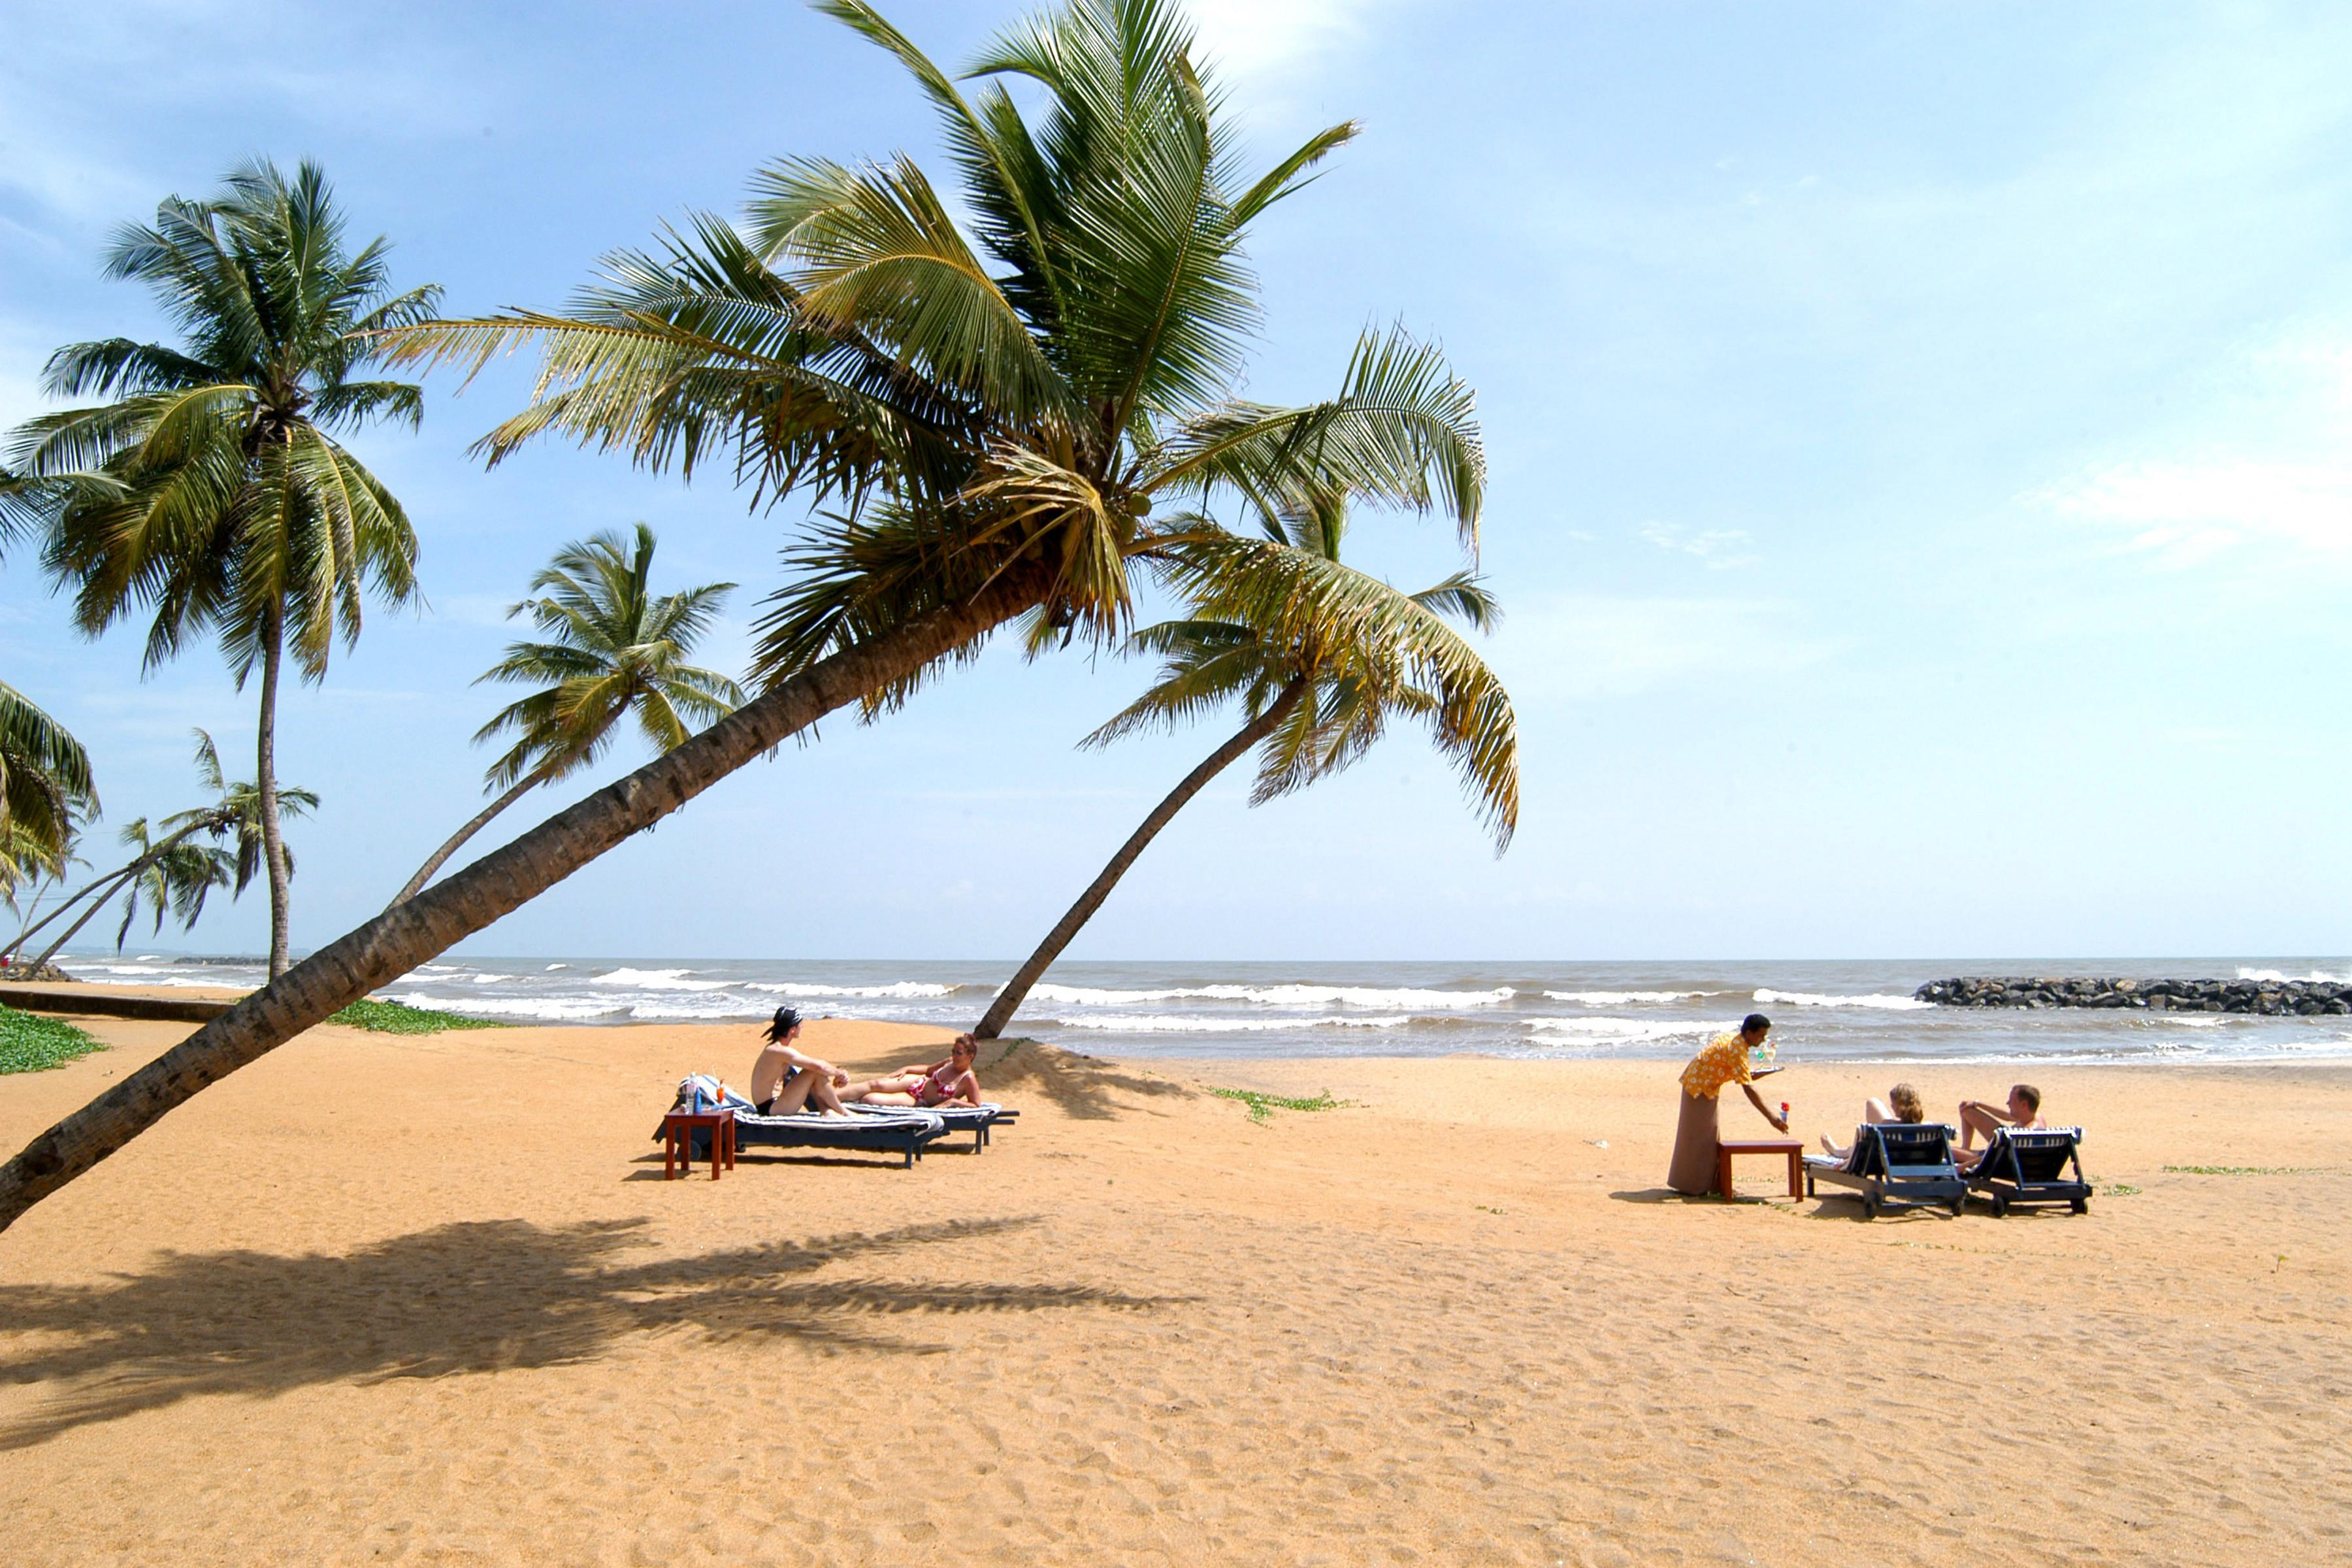 Negombo Beach, Image Credit: shatours